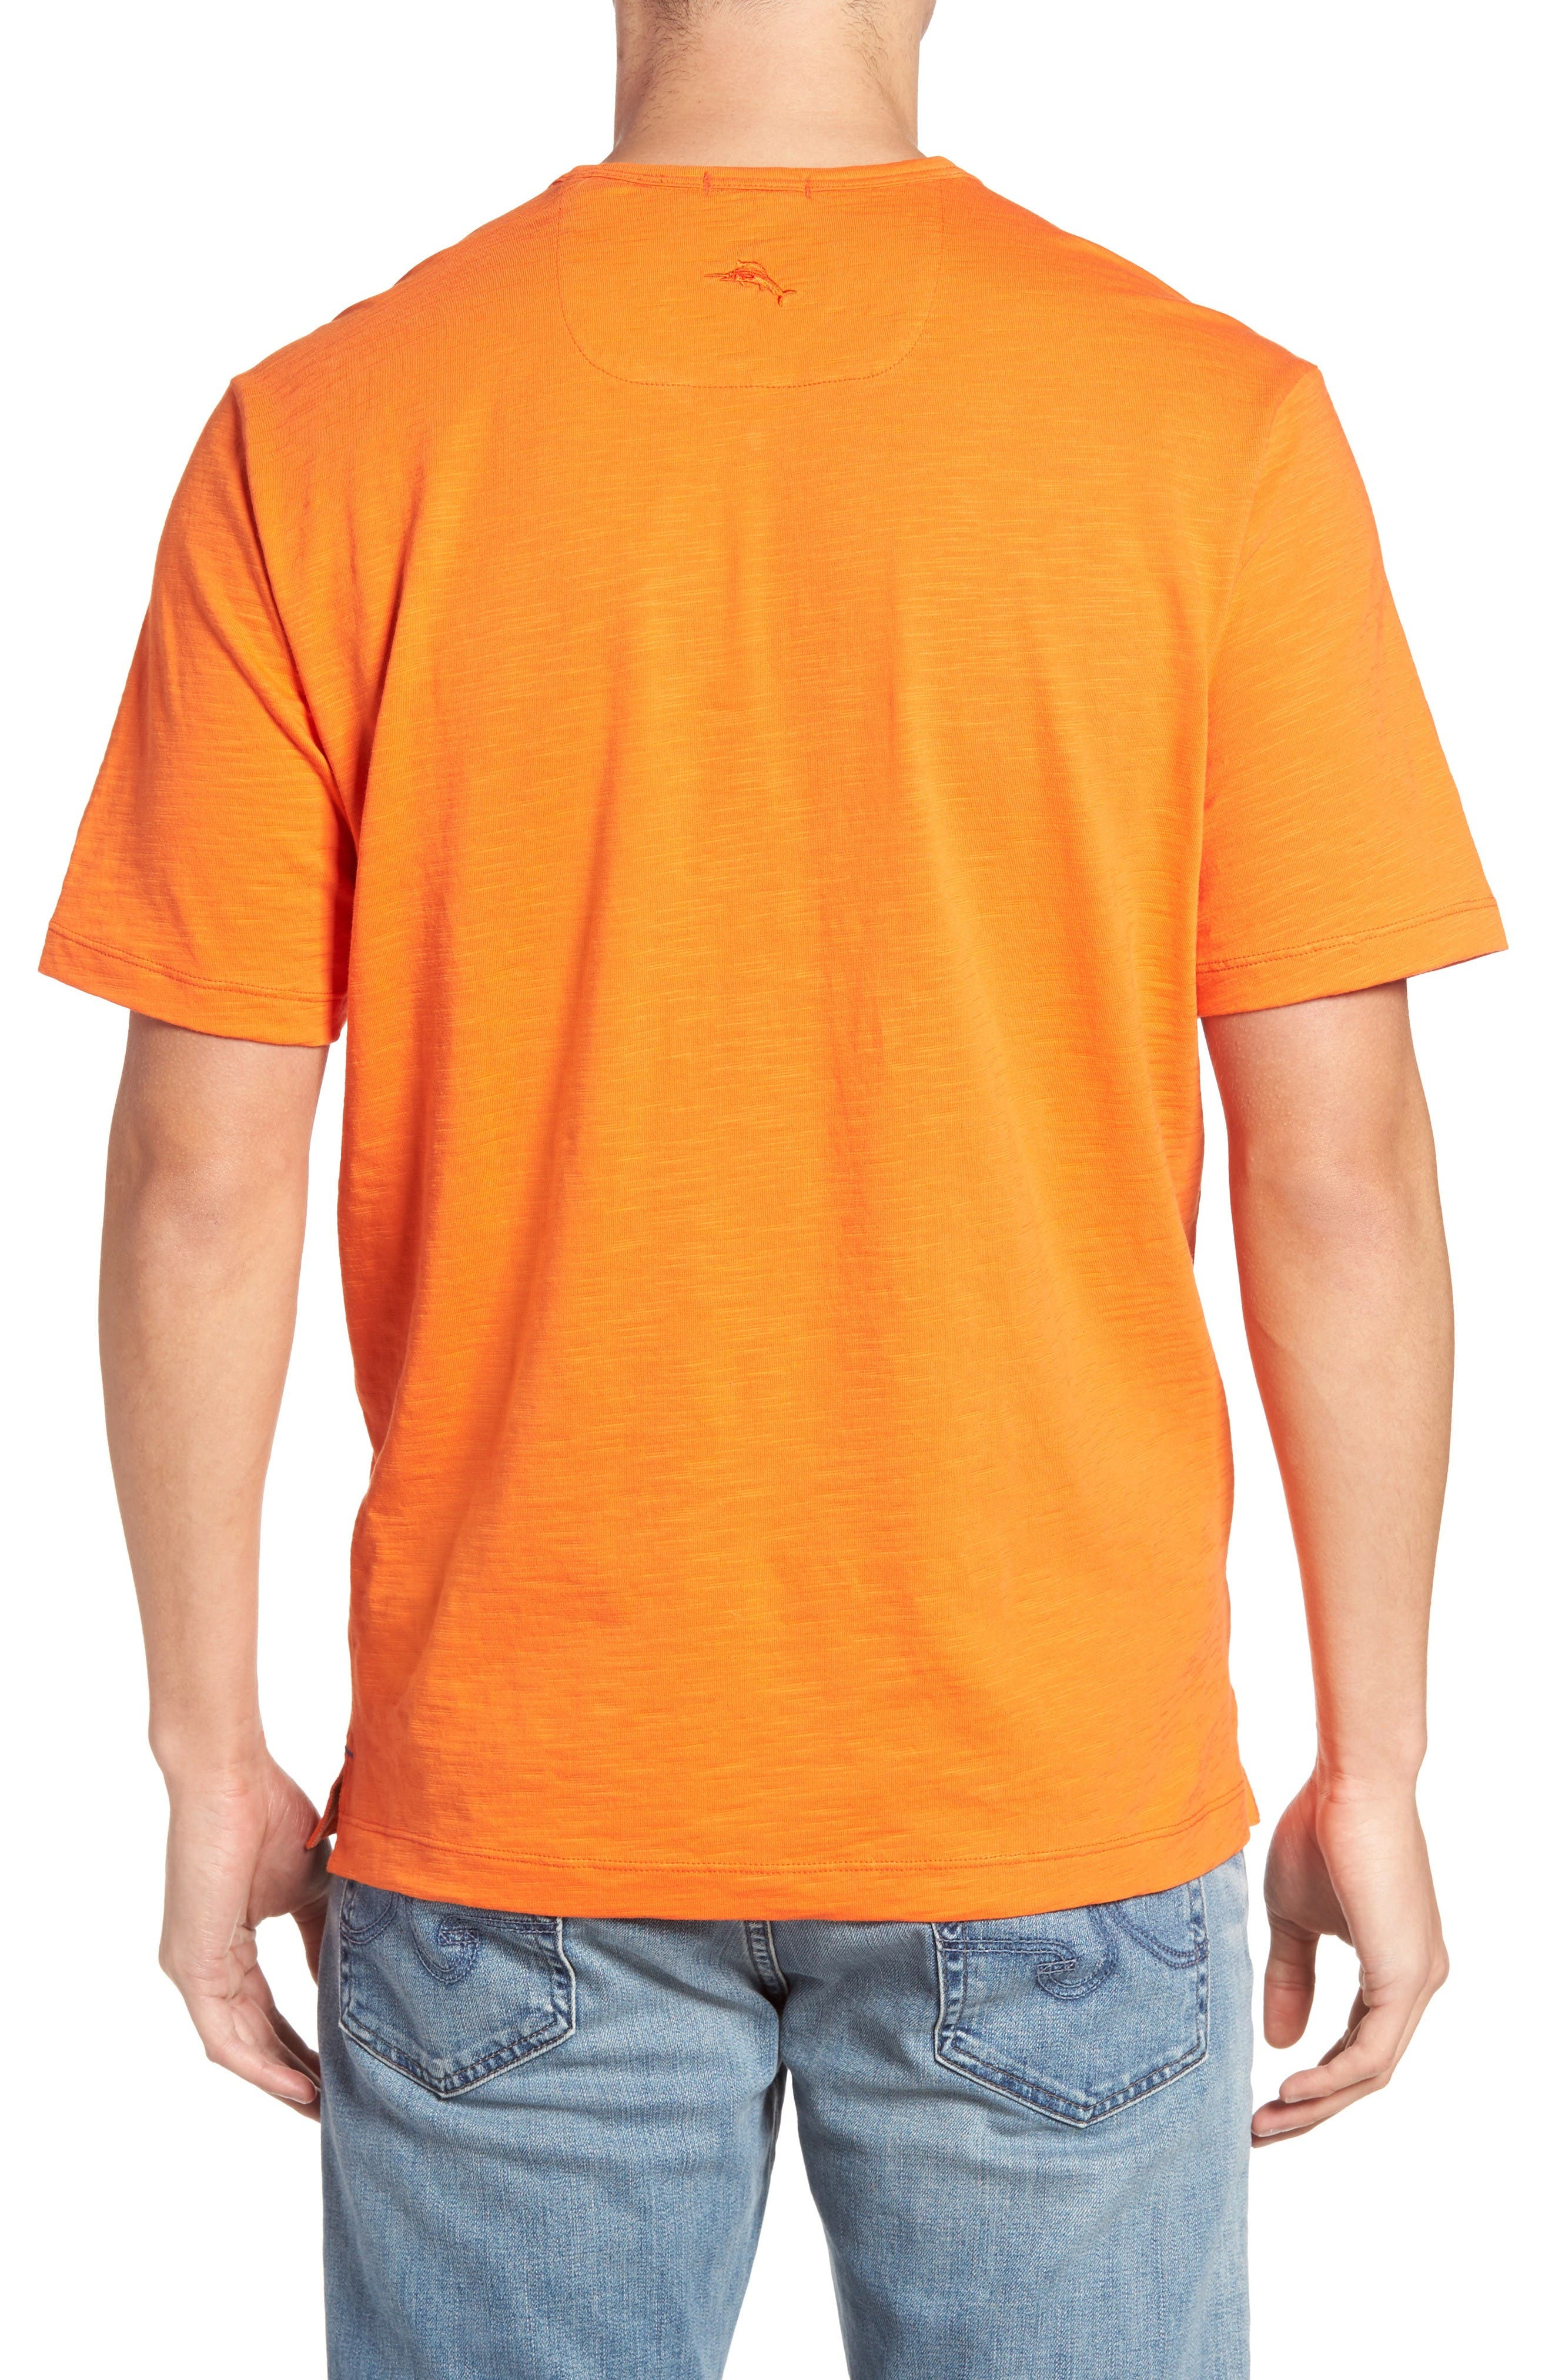 'Portside Player' Pima Cotton T-Shirt,                             Alternate thumbnail 2, color,                             Citrus Punch